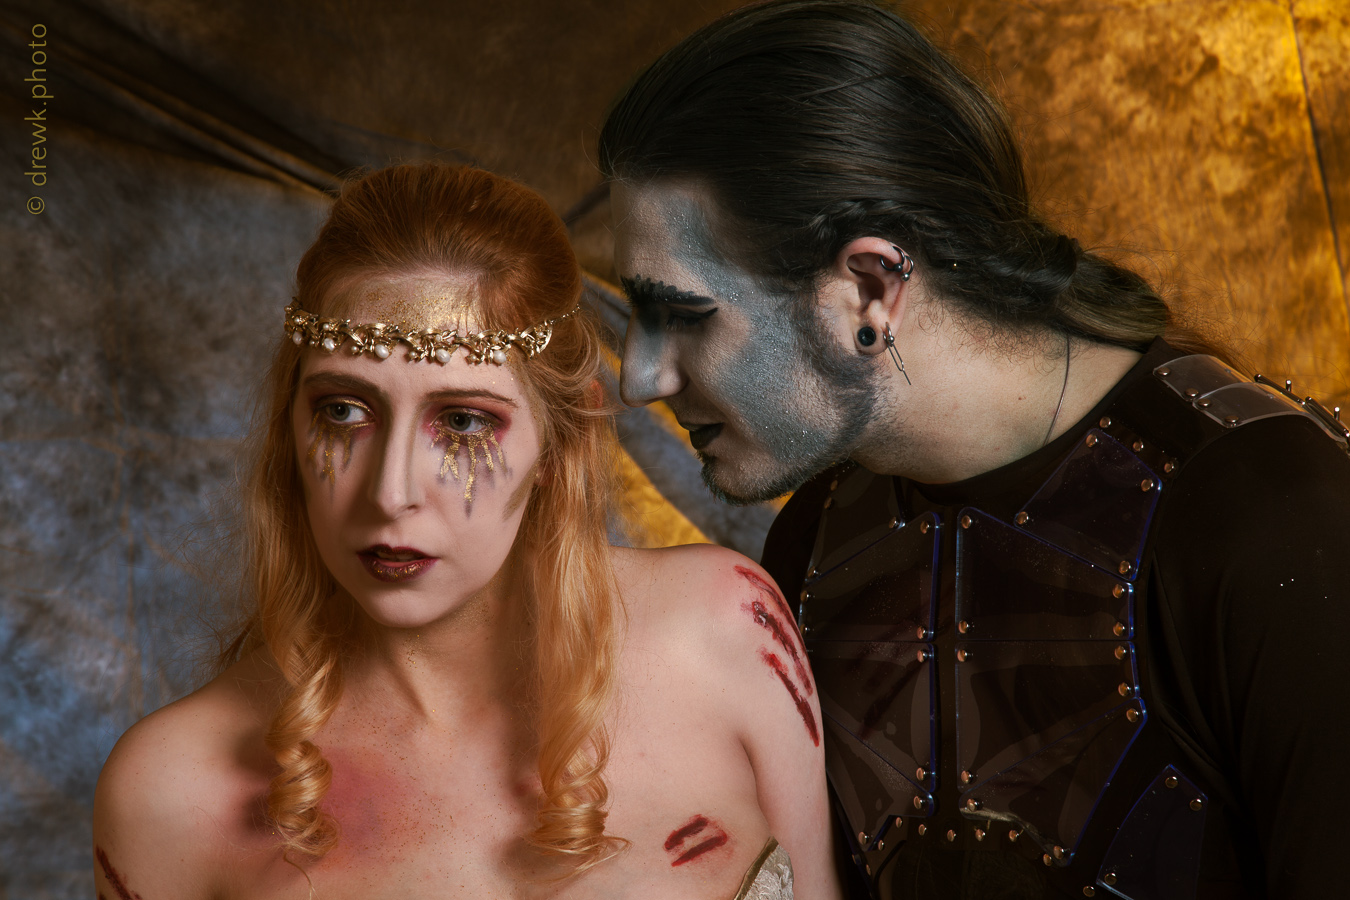 <alt>Hades and Persephone</alt><br/>